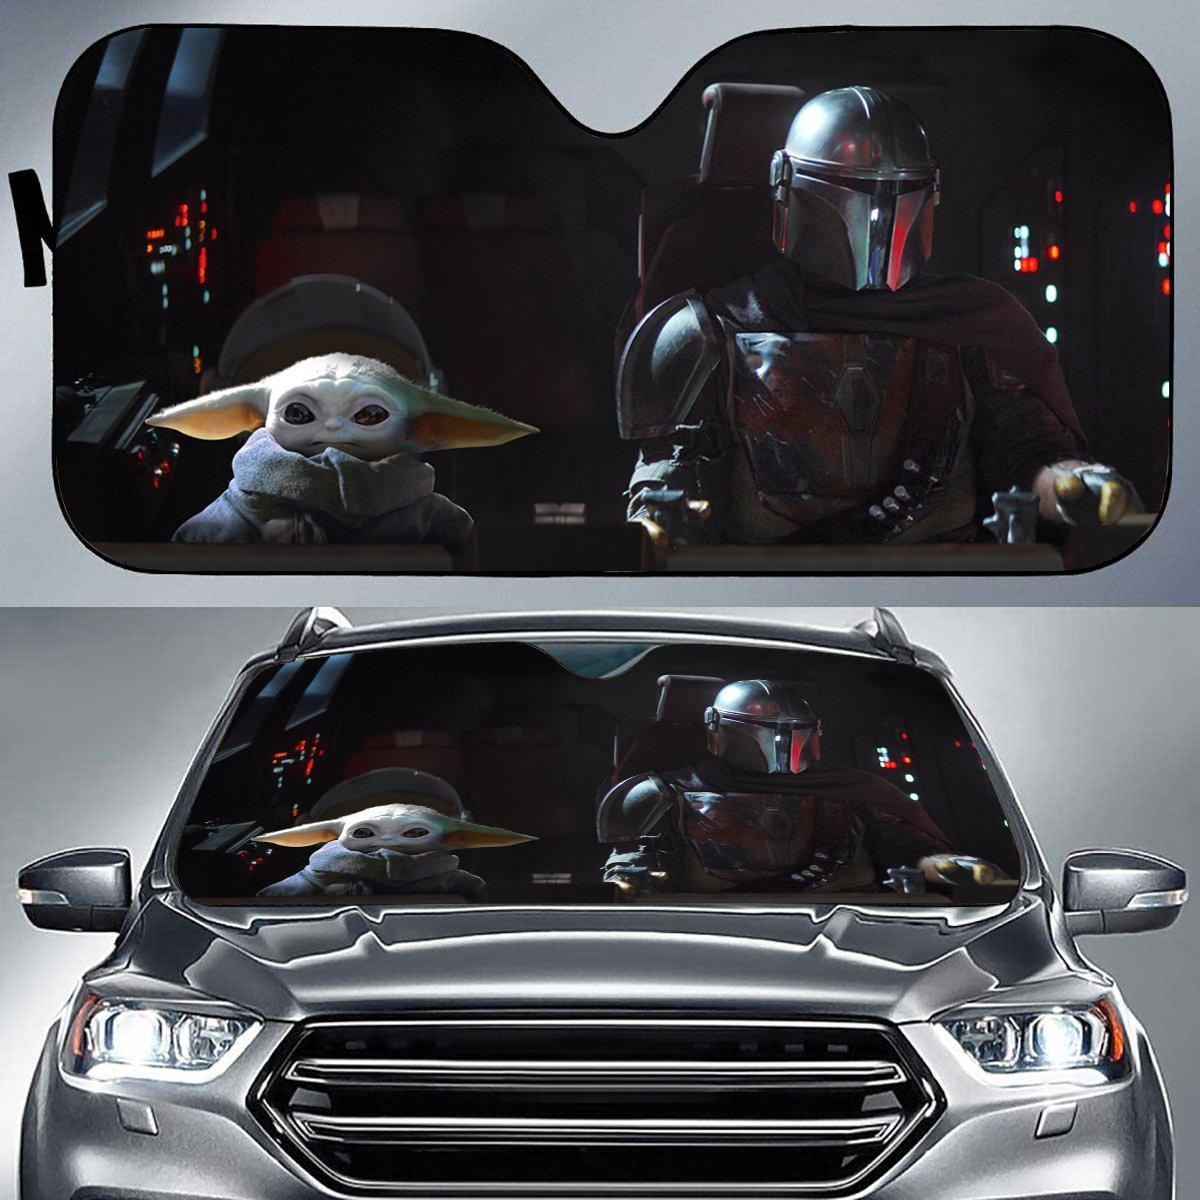 Sws Baby Yoda Auto Sunshade Xrvx